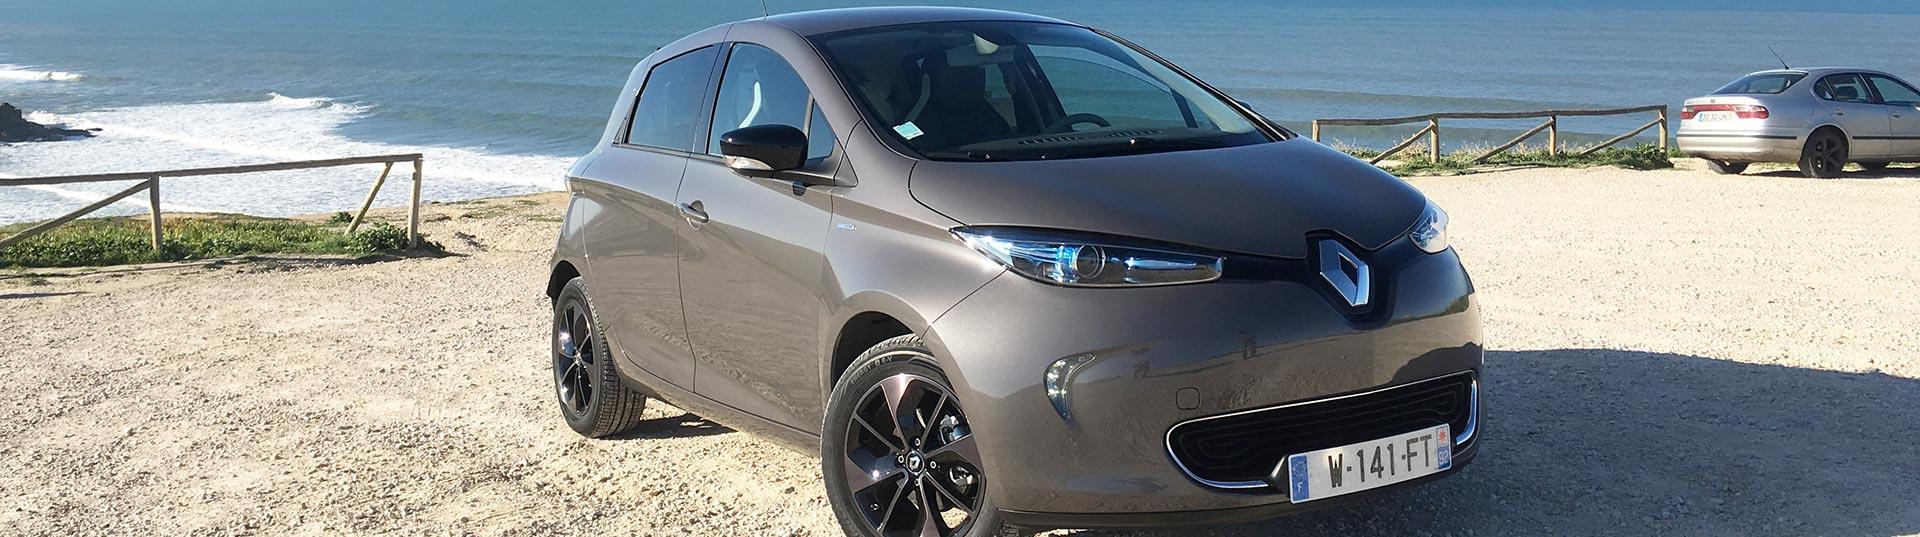 Novo Renault Zoe